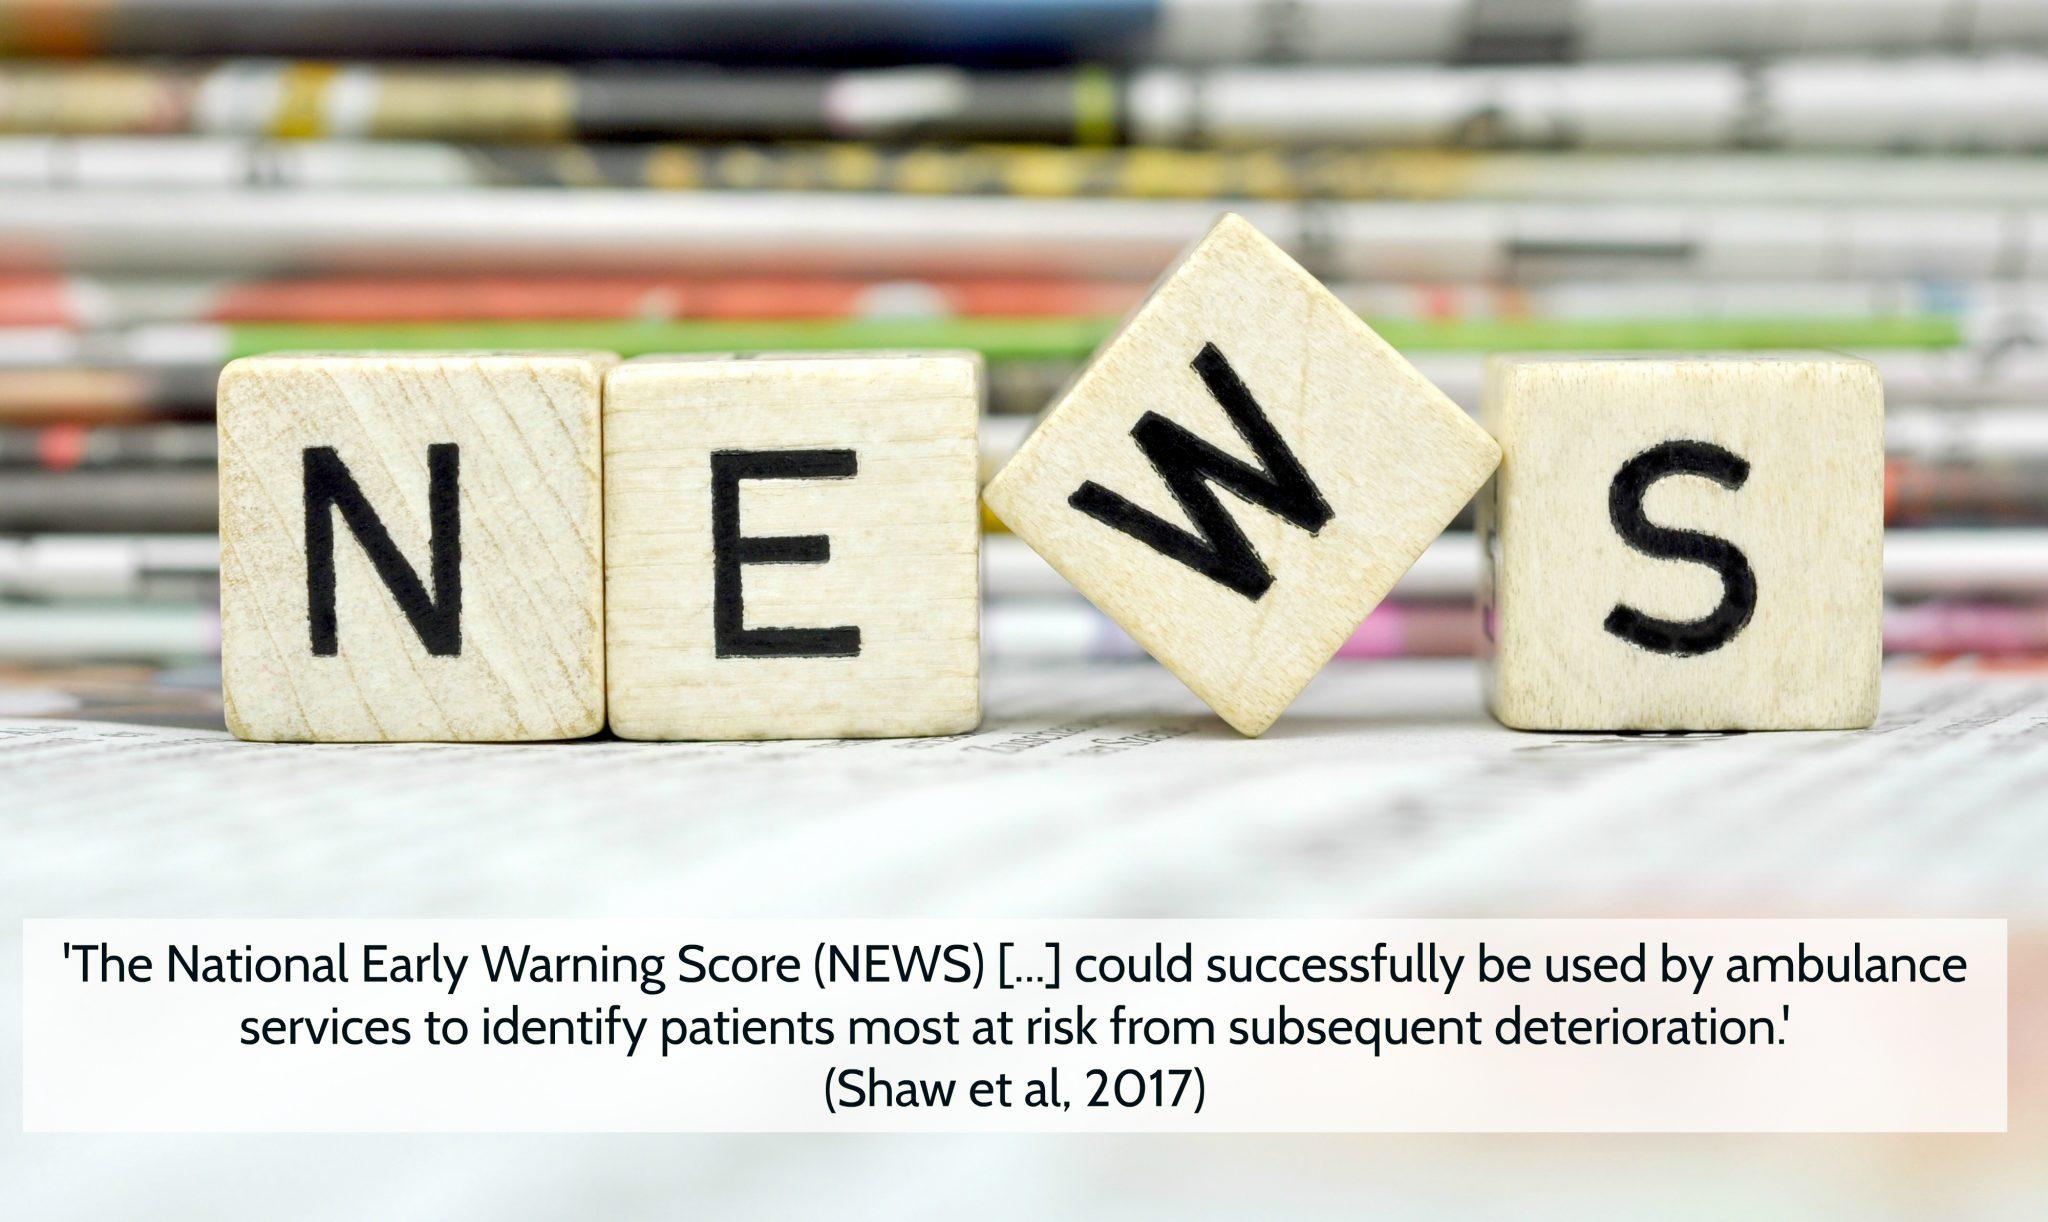 news score